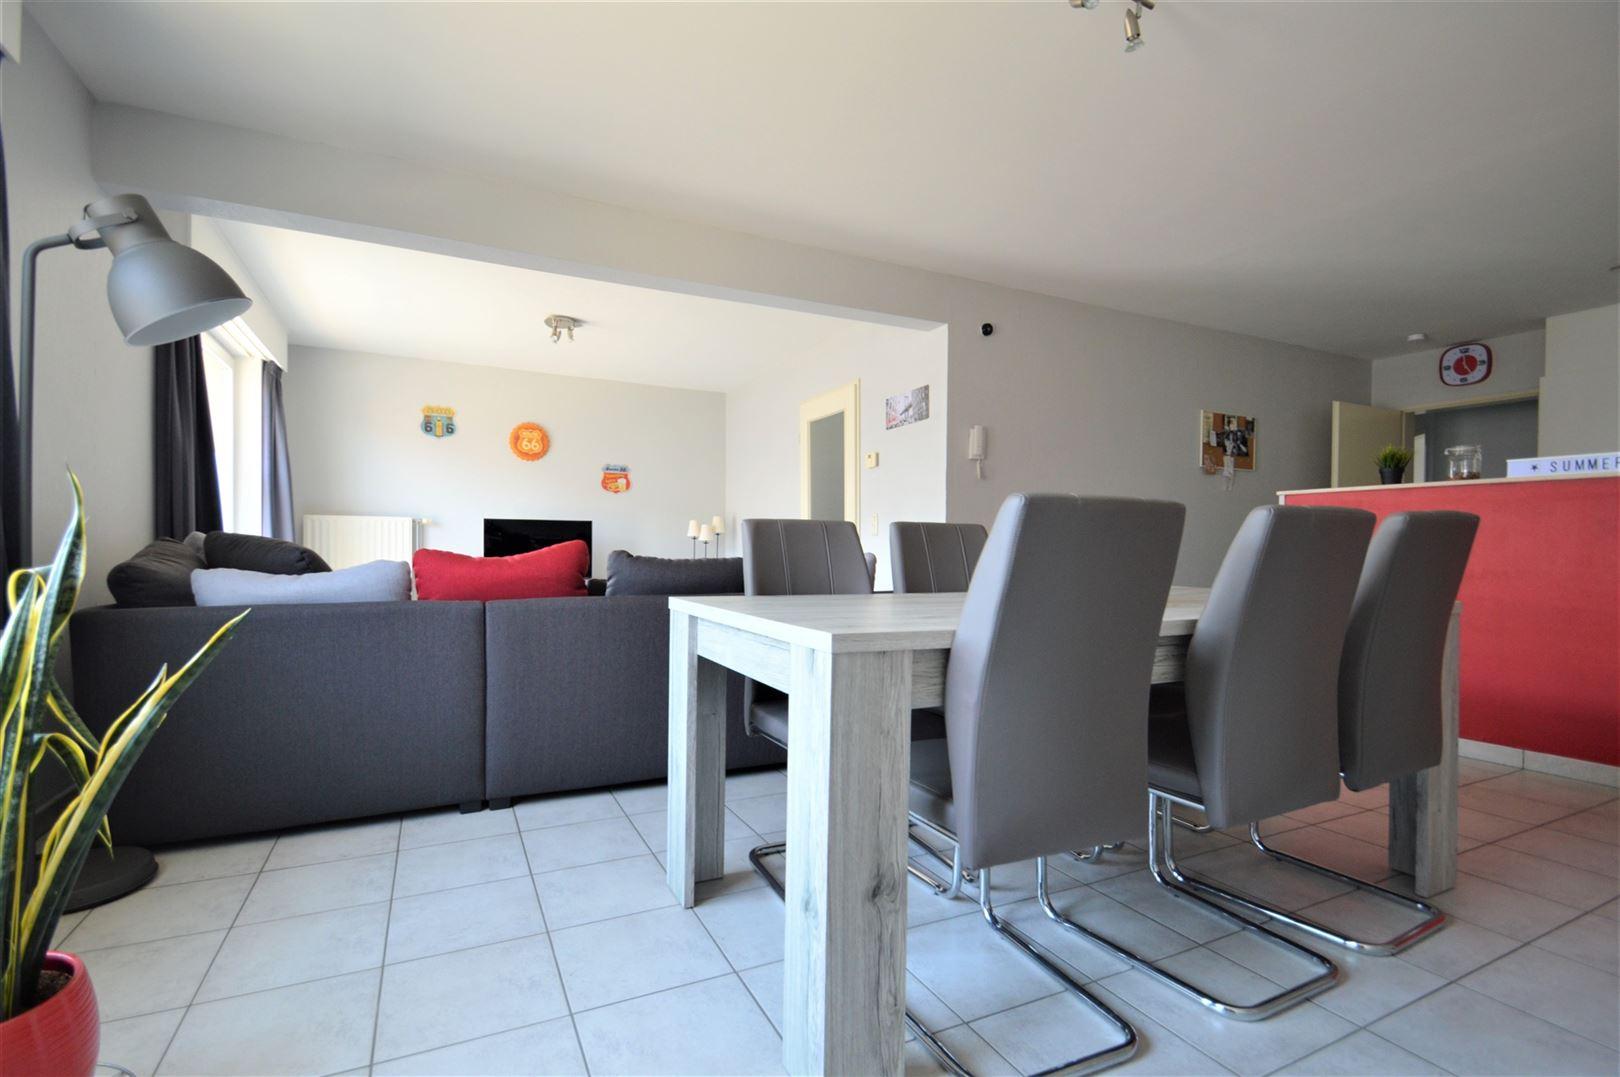 Foto 3 : Appartement te 9200 Baasrode (België) - Prijs € 630